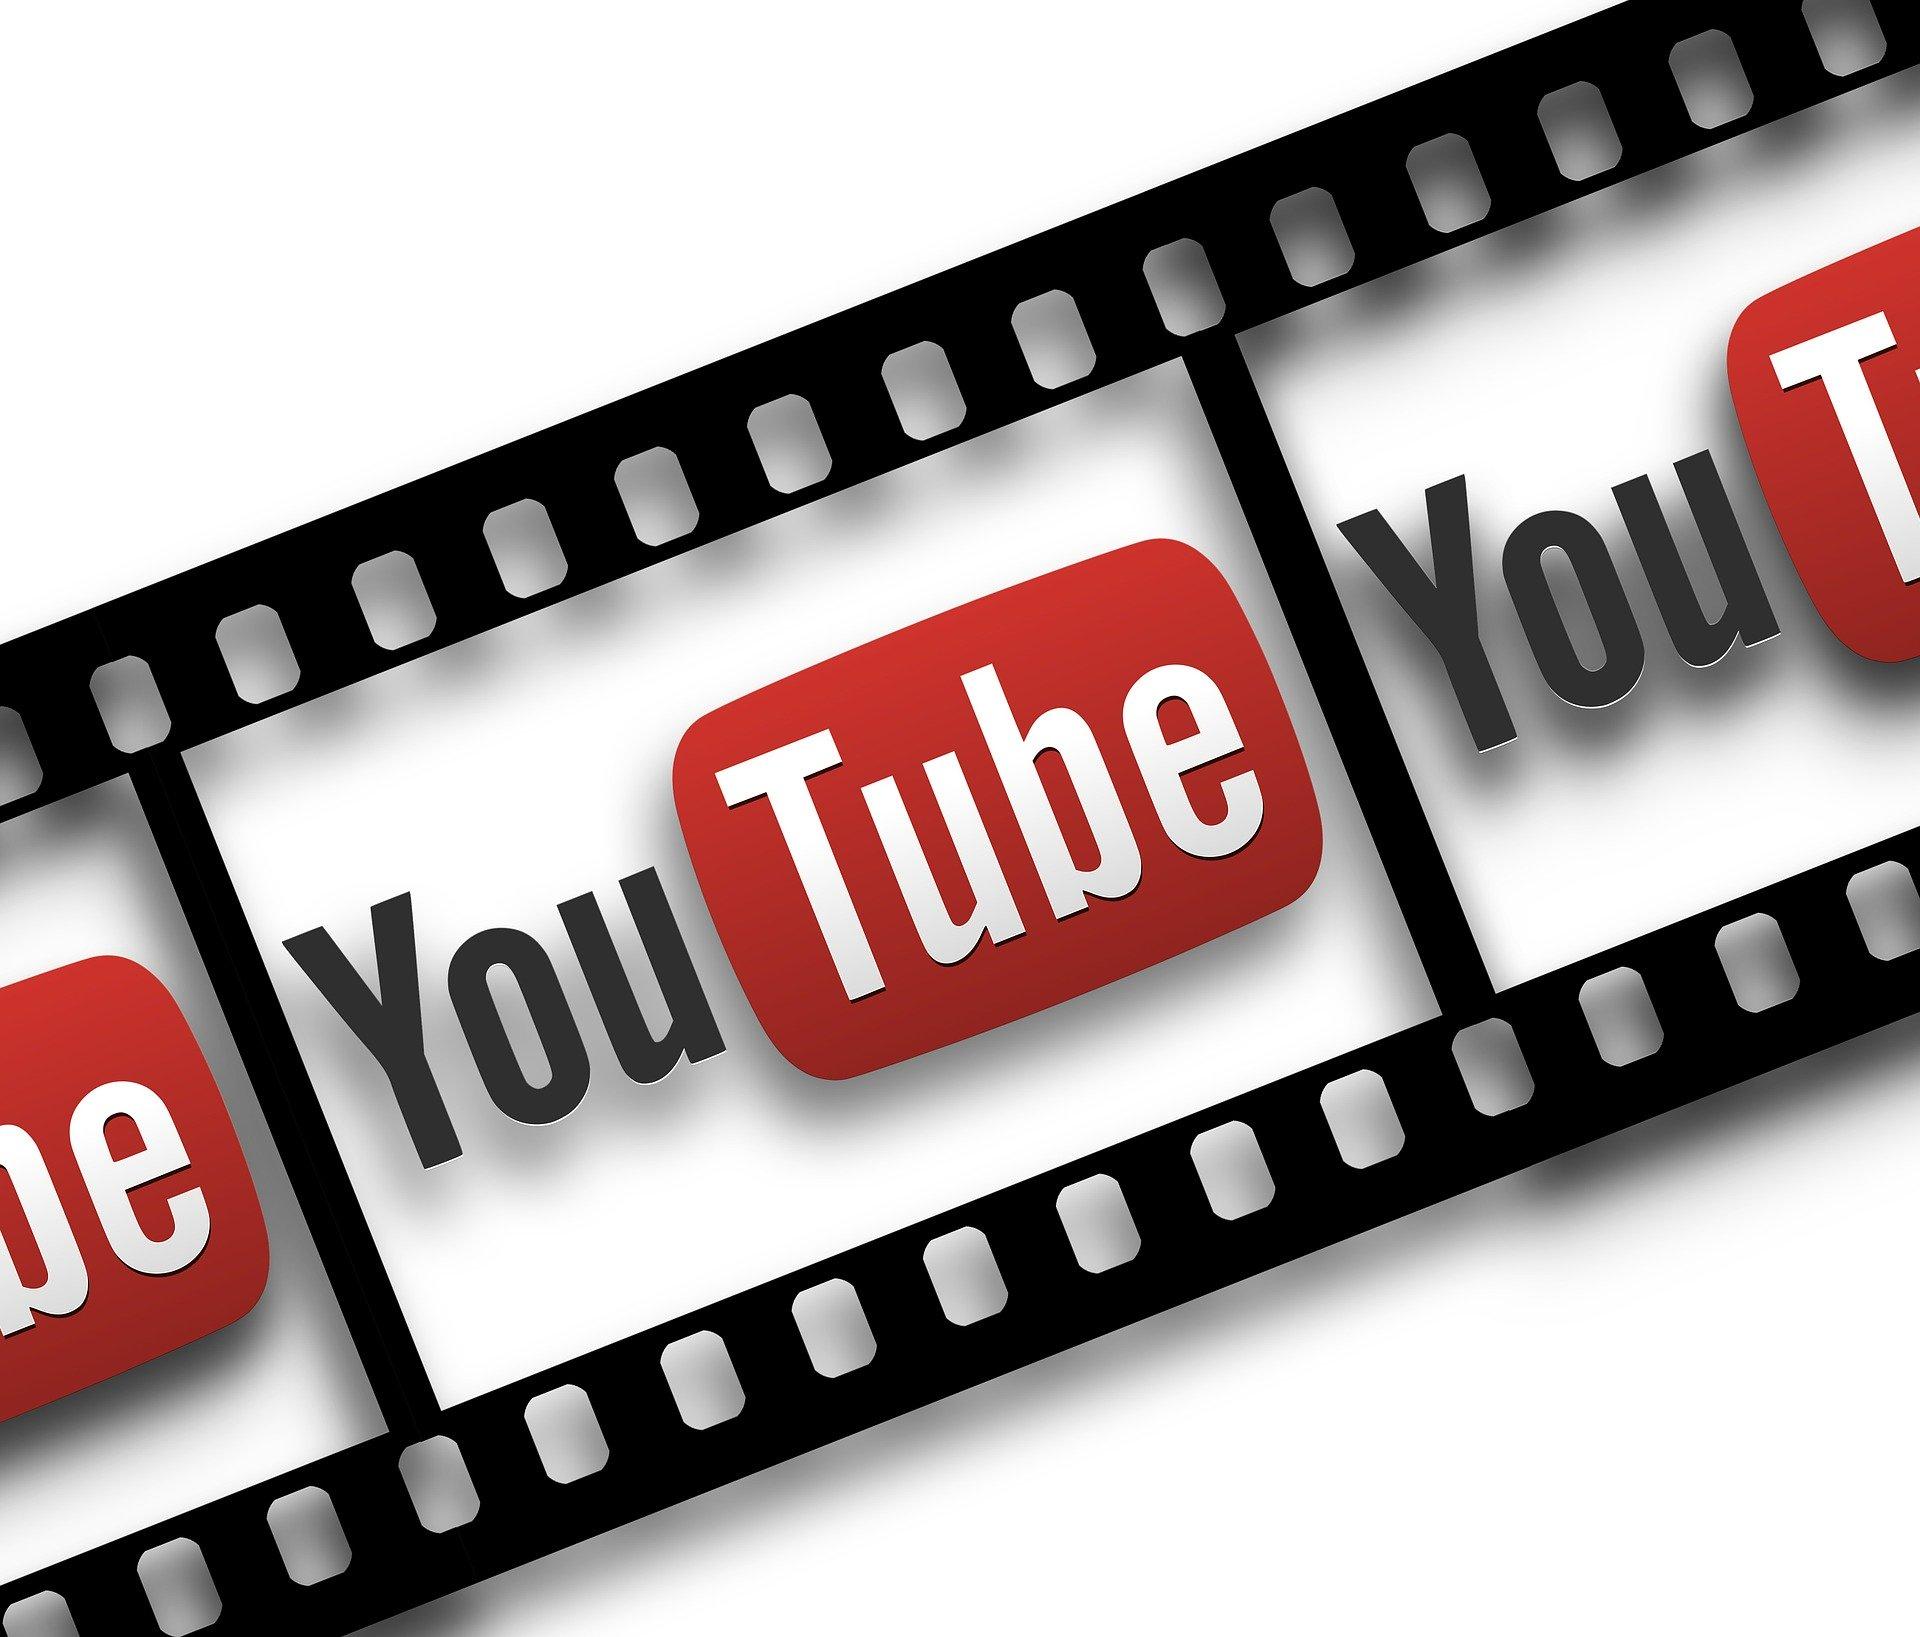 Burundi, Chad, Ethiopia and Sudan Revoke YouTube Access Throughout 2010s